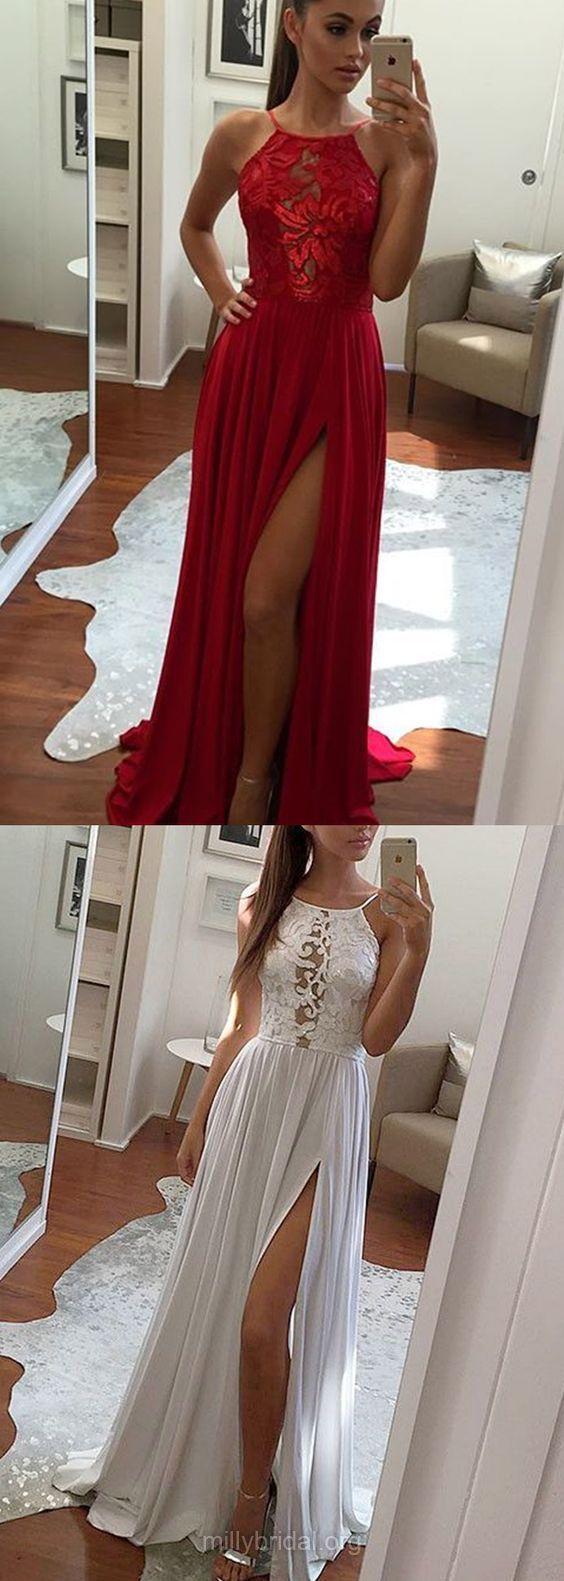 Red Prom Dresses, Long Prom Dresses, 2018 Prom Dresses Lace, A-line Prom Dresses Scoop Neck, Chiffon Prom Dresses Split Front #reddresses